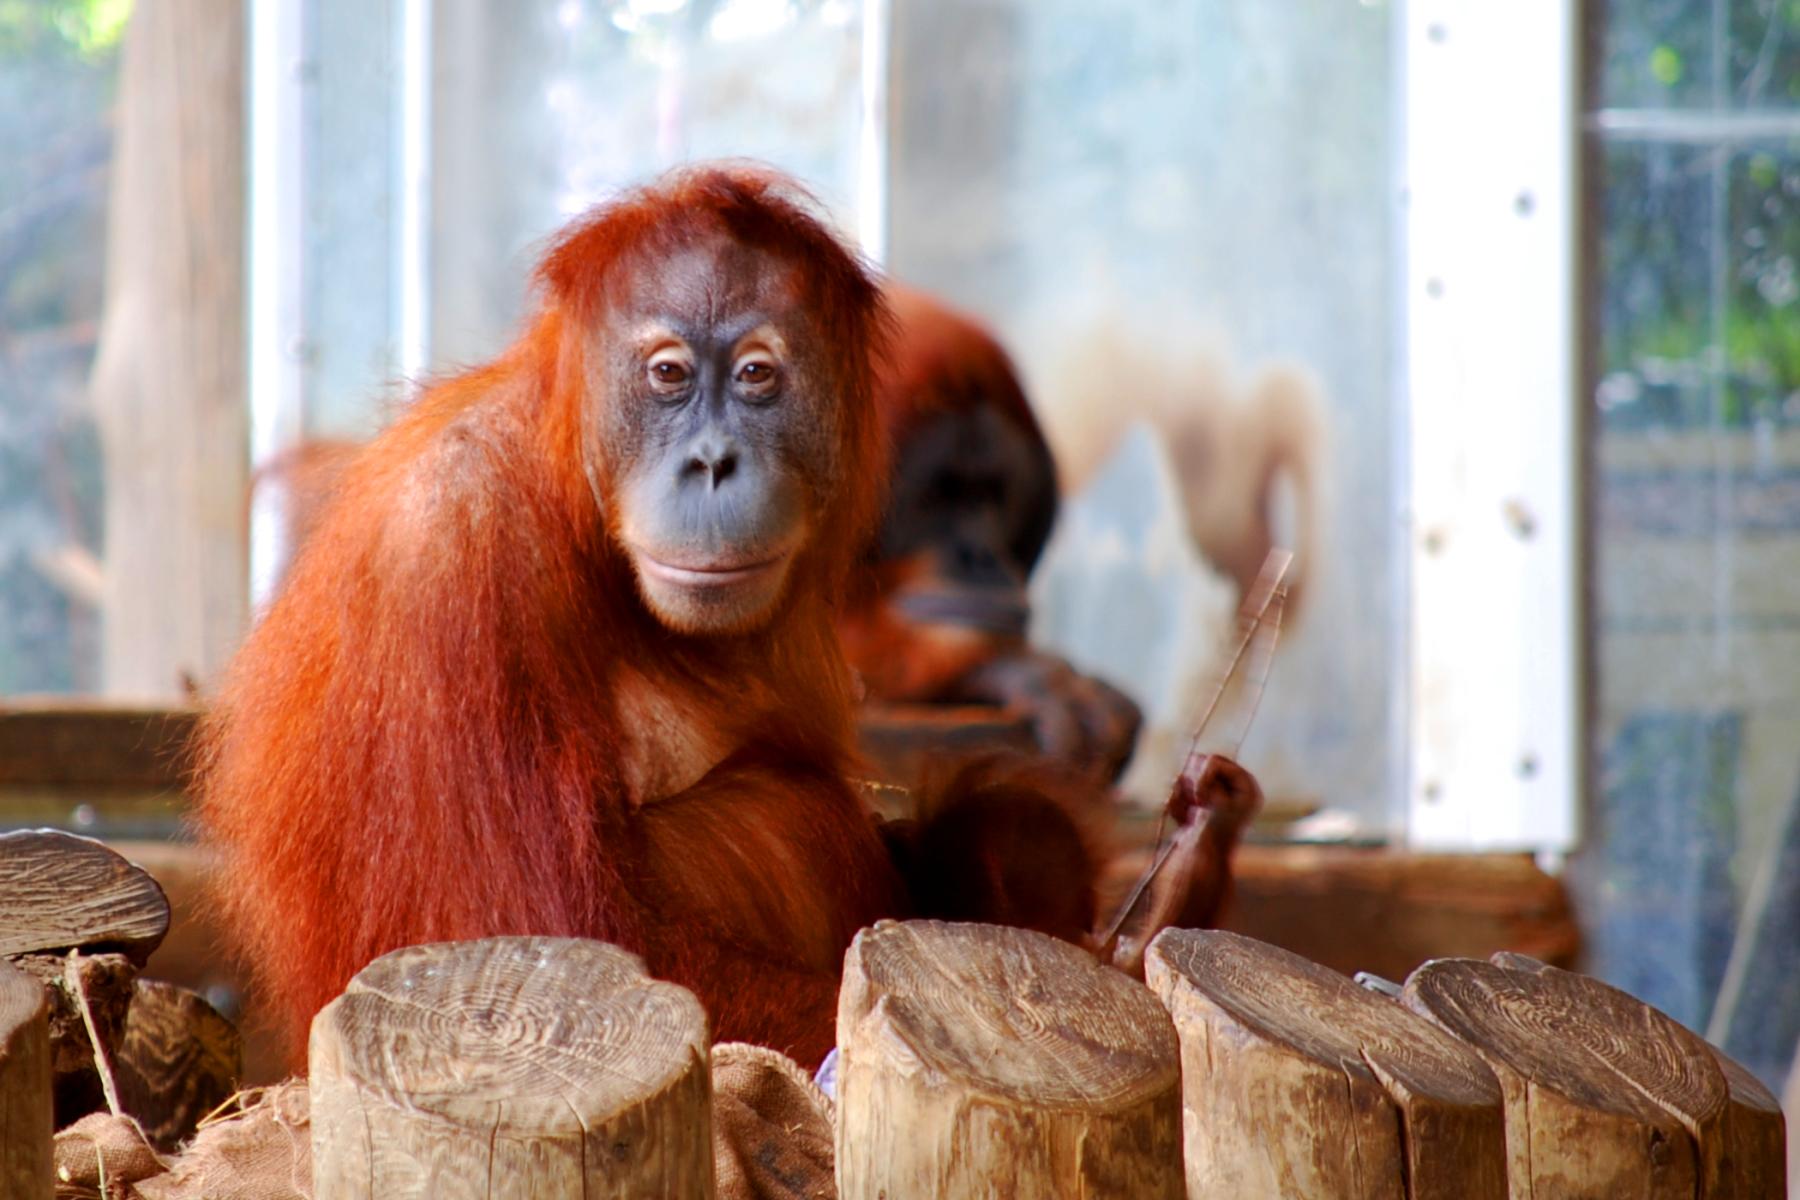 sumatran orangutan An extremely rare baby orangutan has been born at the zoo.